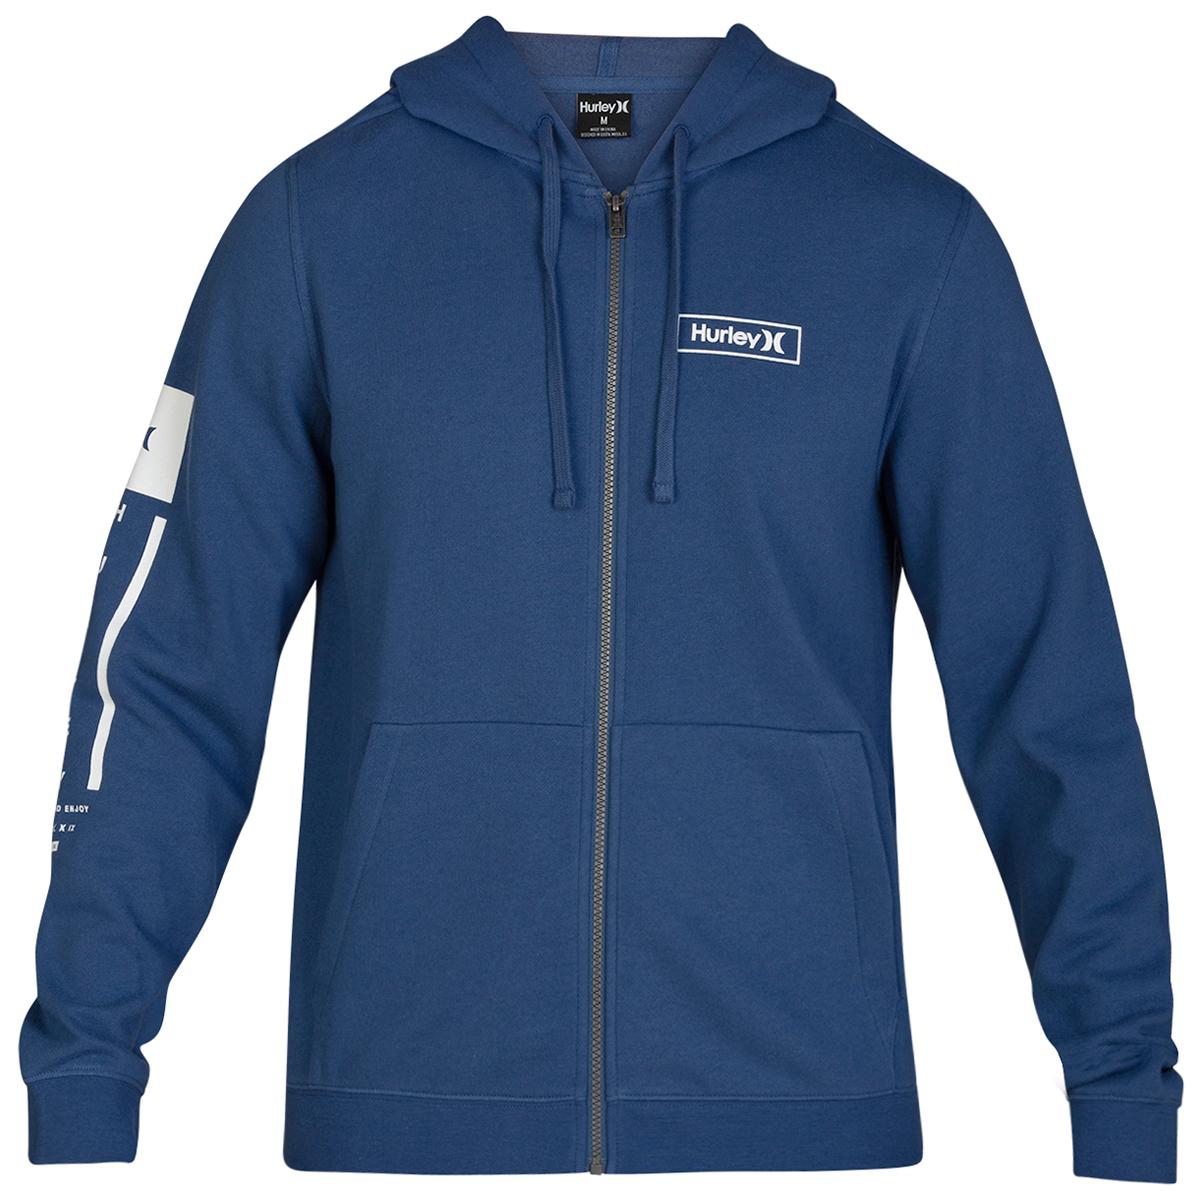 Hurley Men's Right Arm Full-Zip Jacket - Blue, M